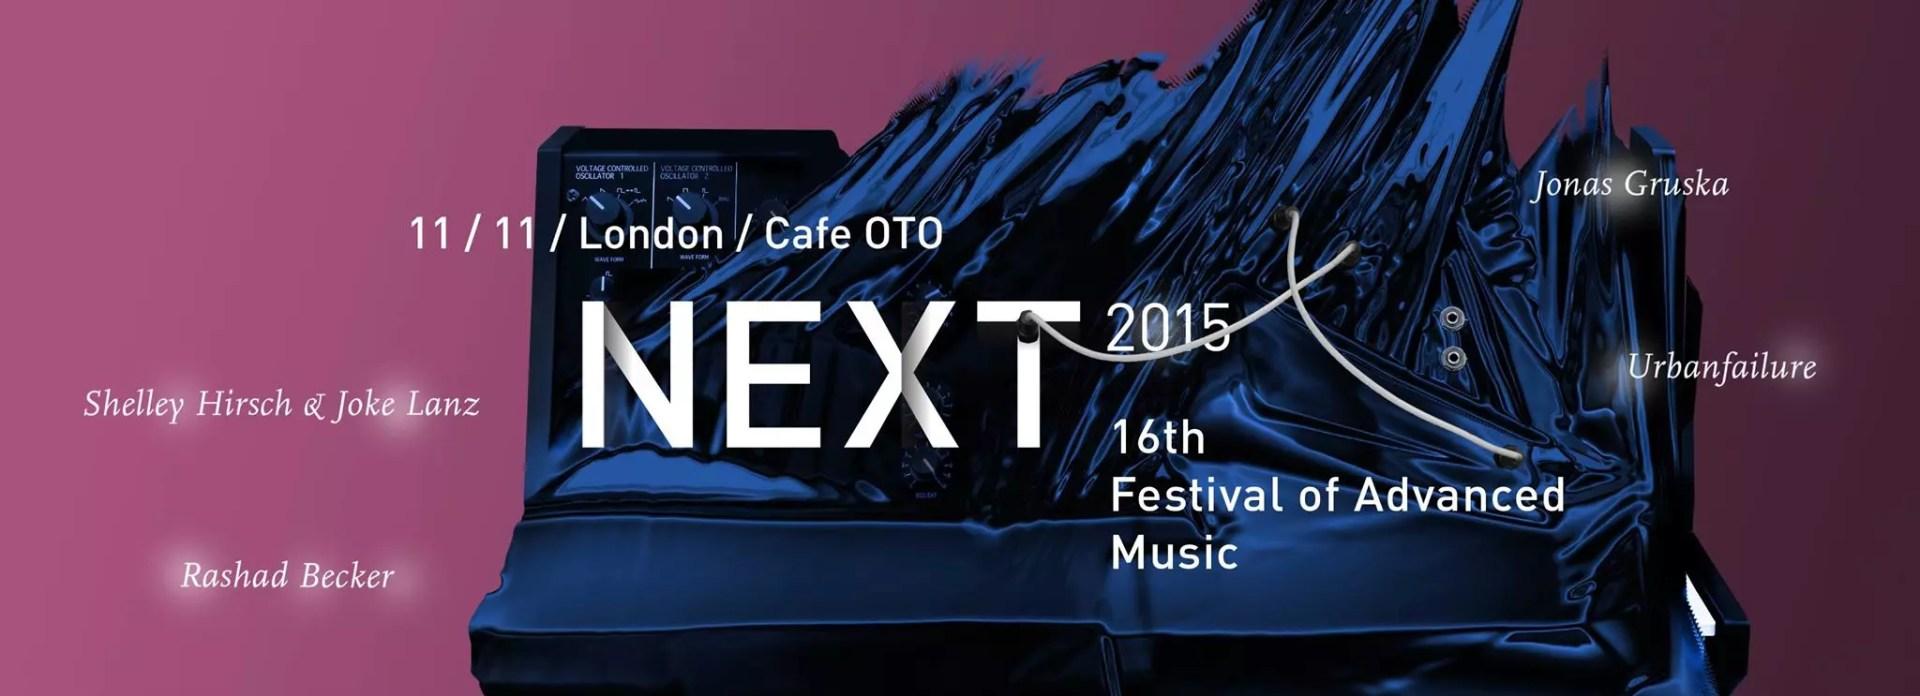 11 November 2015 :: urbanfailure will perform live @ Next Festival / London / Cafe OTO